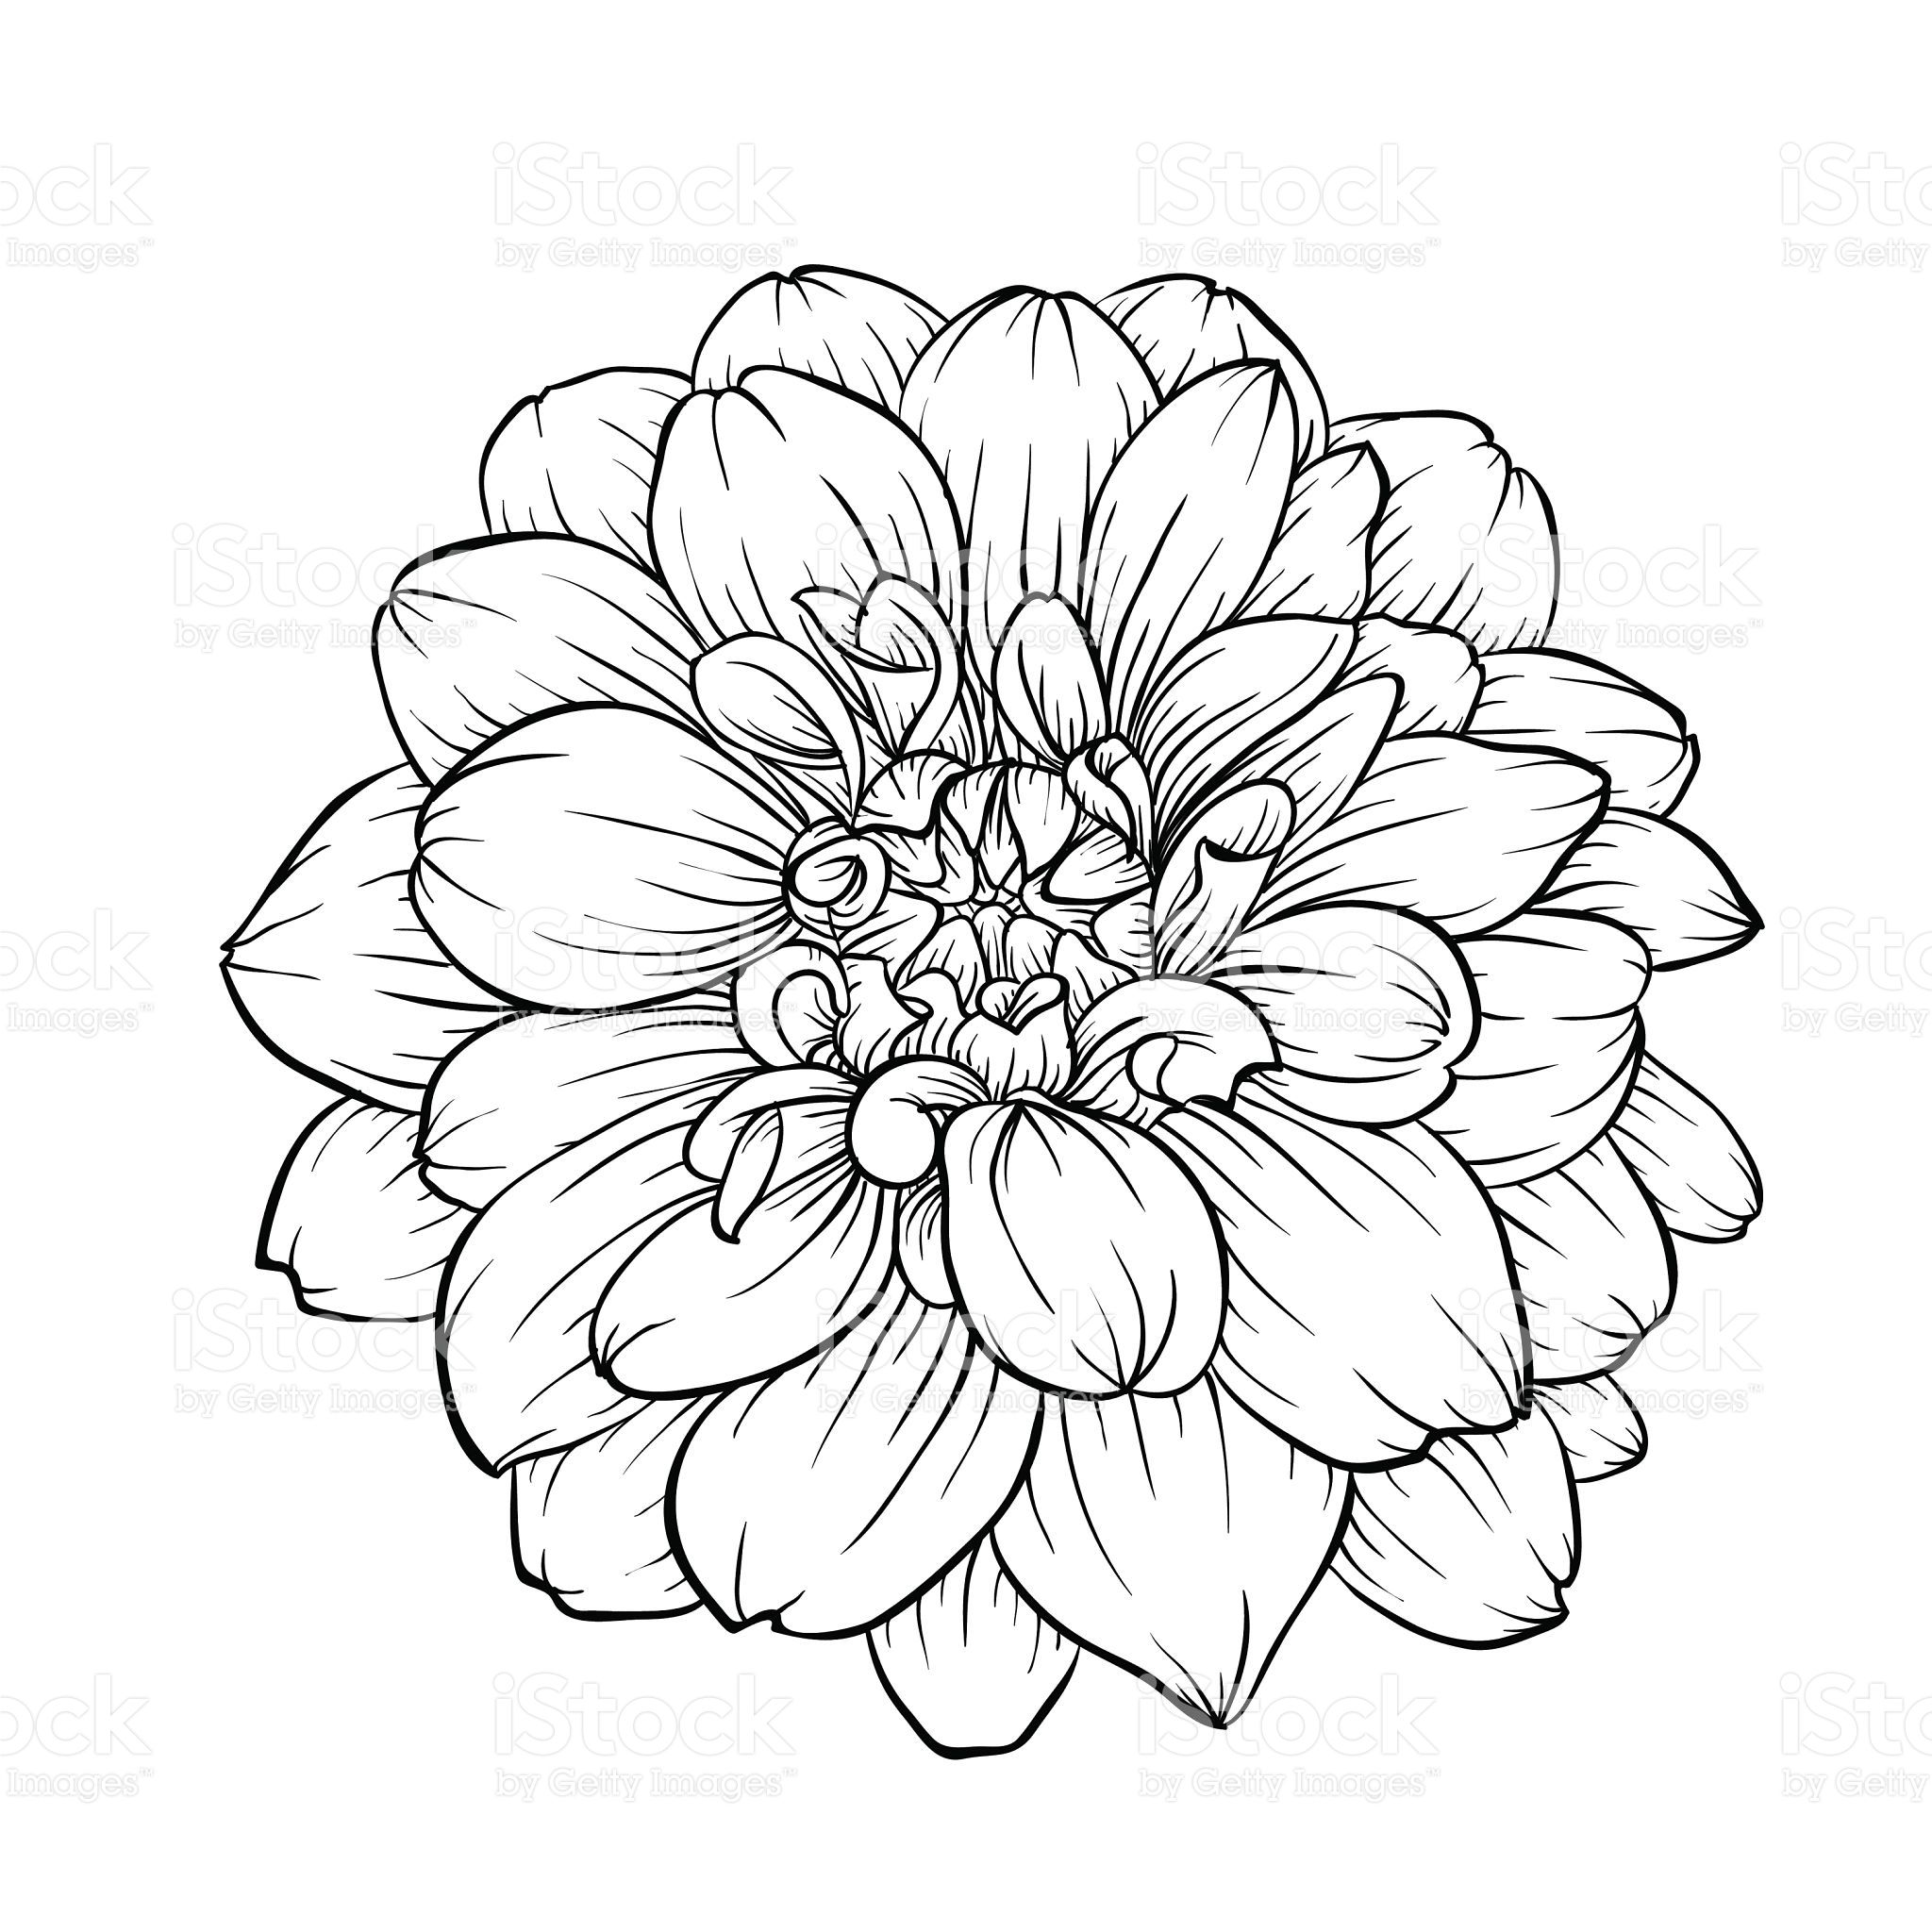 Black dahlia clipart clipart royalty free library beautiful monochrome black and white dahlia flower isolated on ... clipart royalty free library